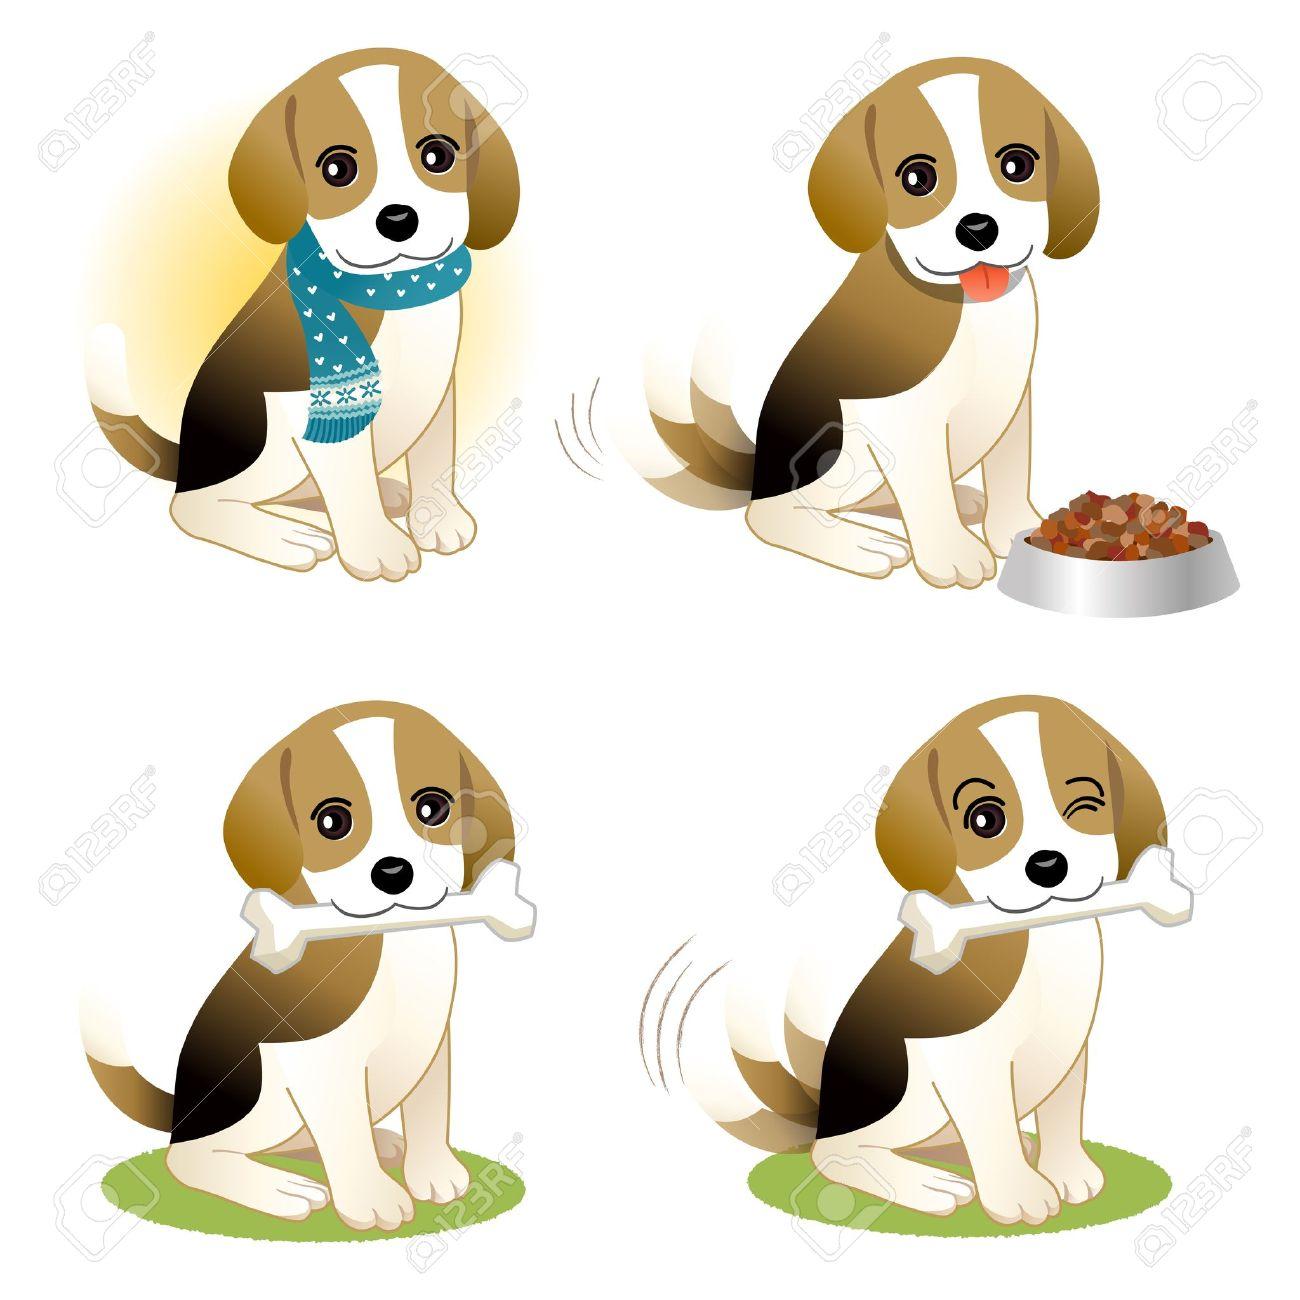 Perro pencil and in. Beagle clipart cartoon